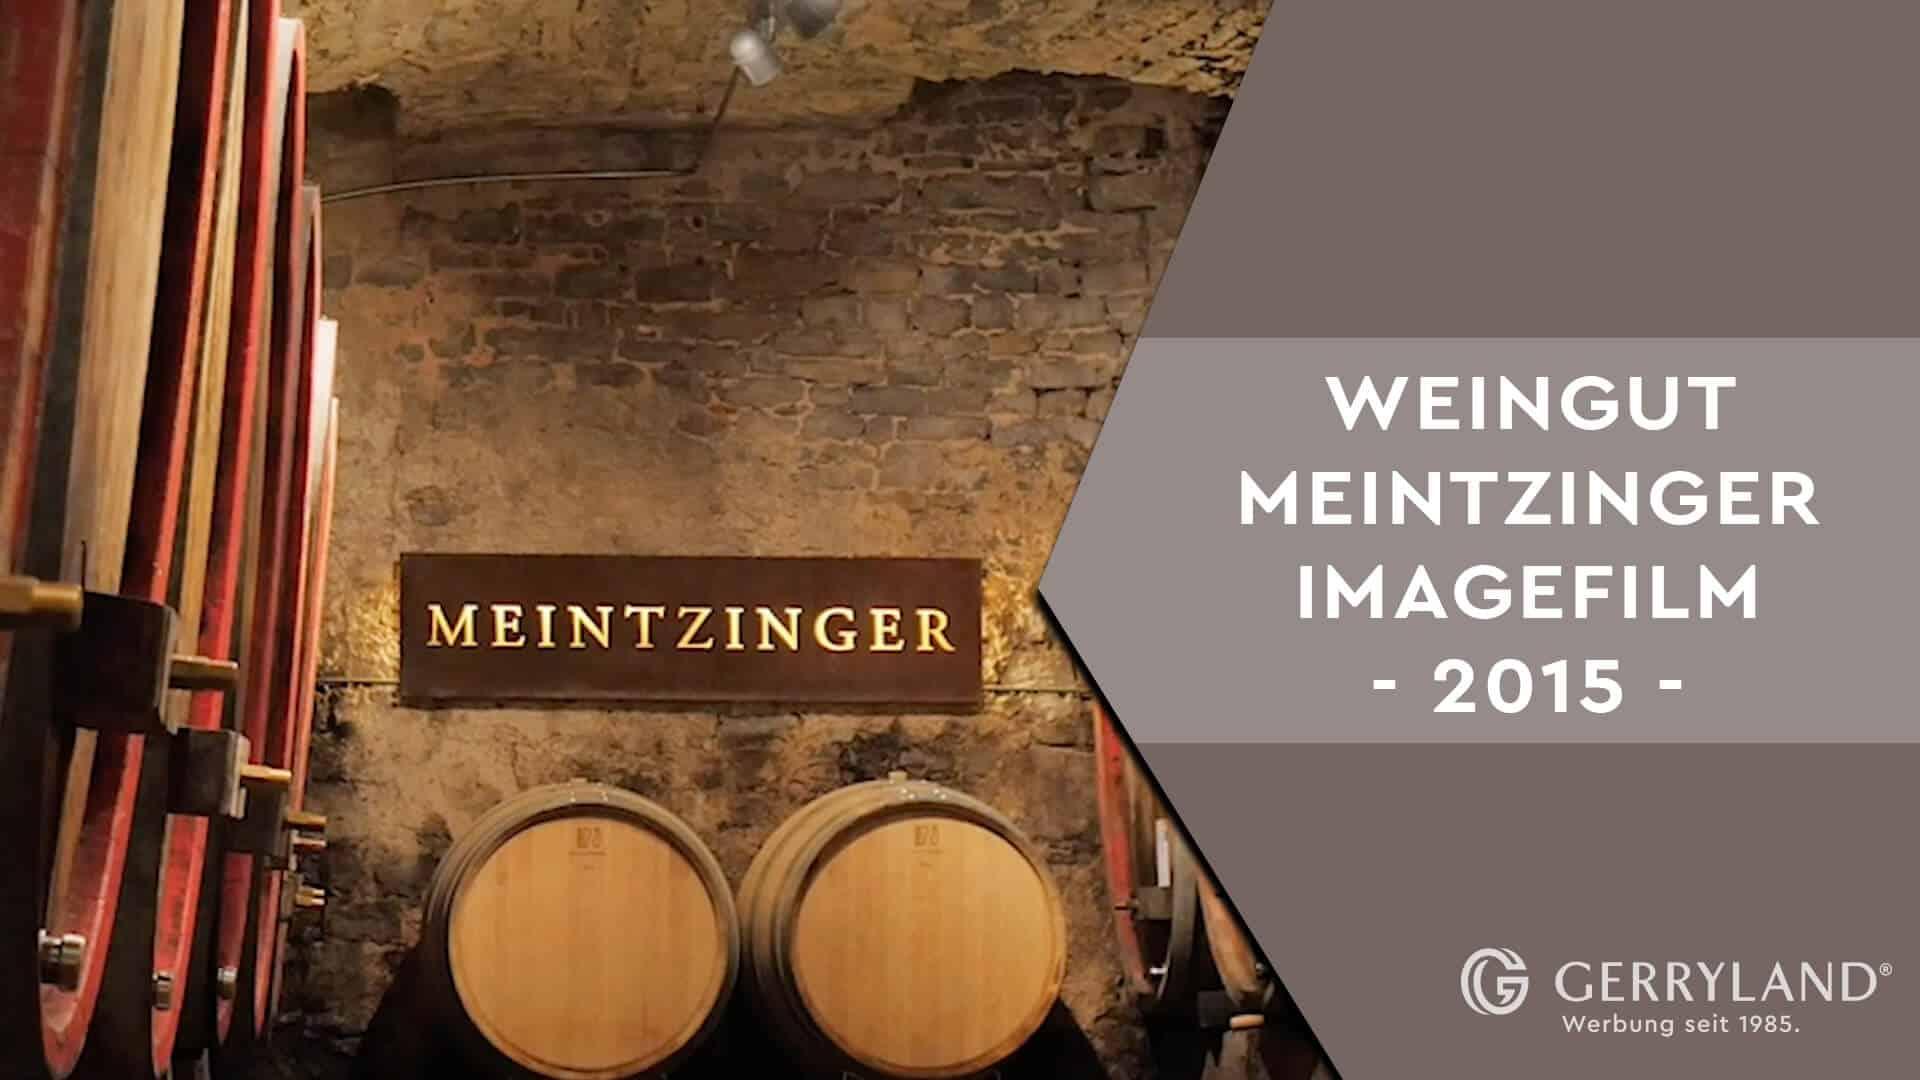 Gerryland-Youtube-Neukonzipierung-Weingut-Meintzinger-Imagefilm-2015_Thumb